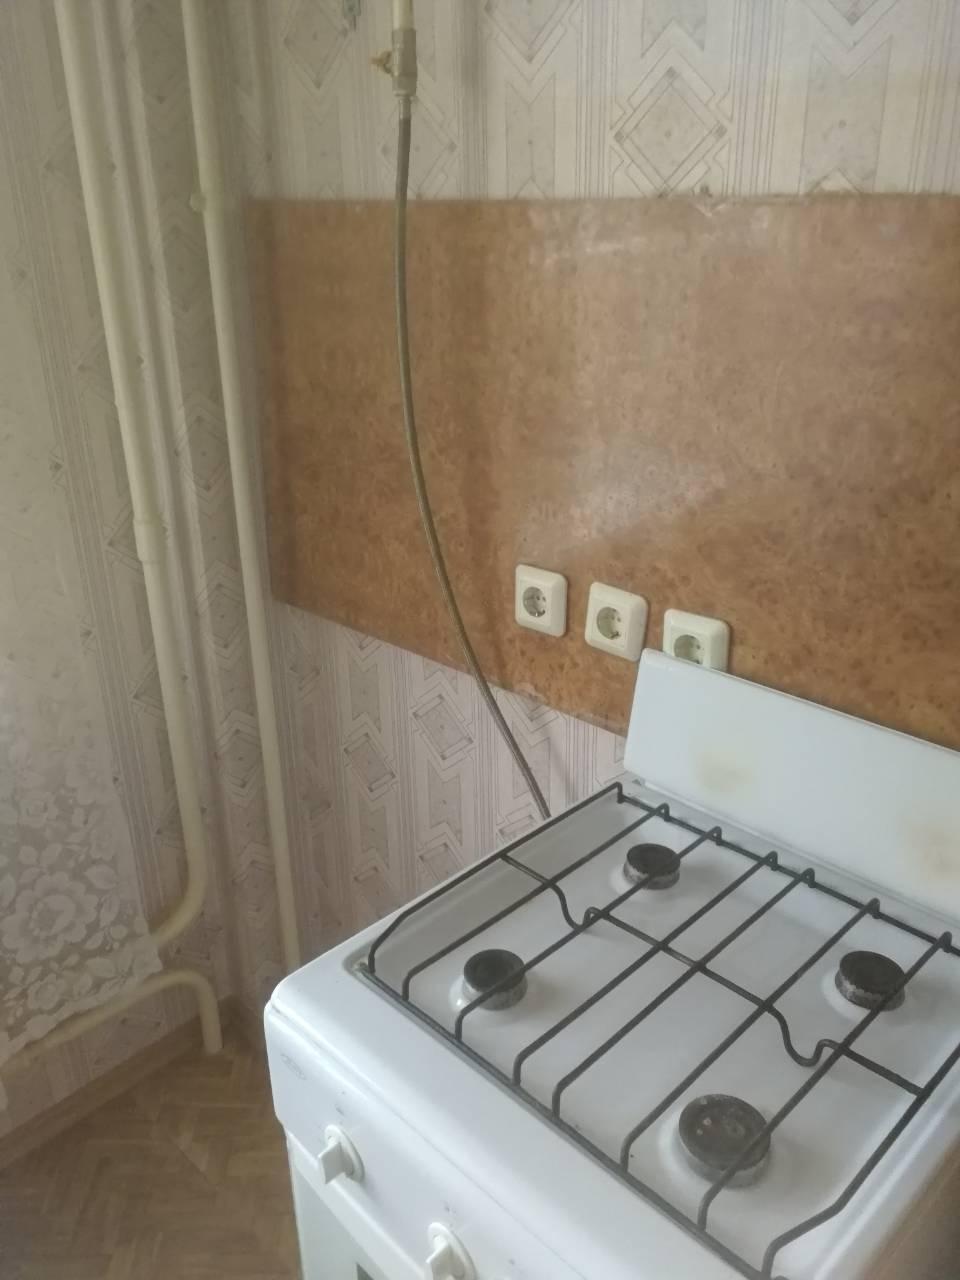 Однокомнатная квартира -  ул.Никольская, д. 2 а